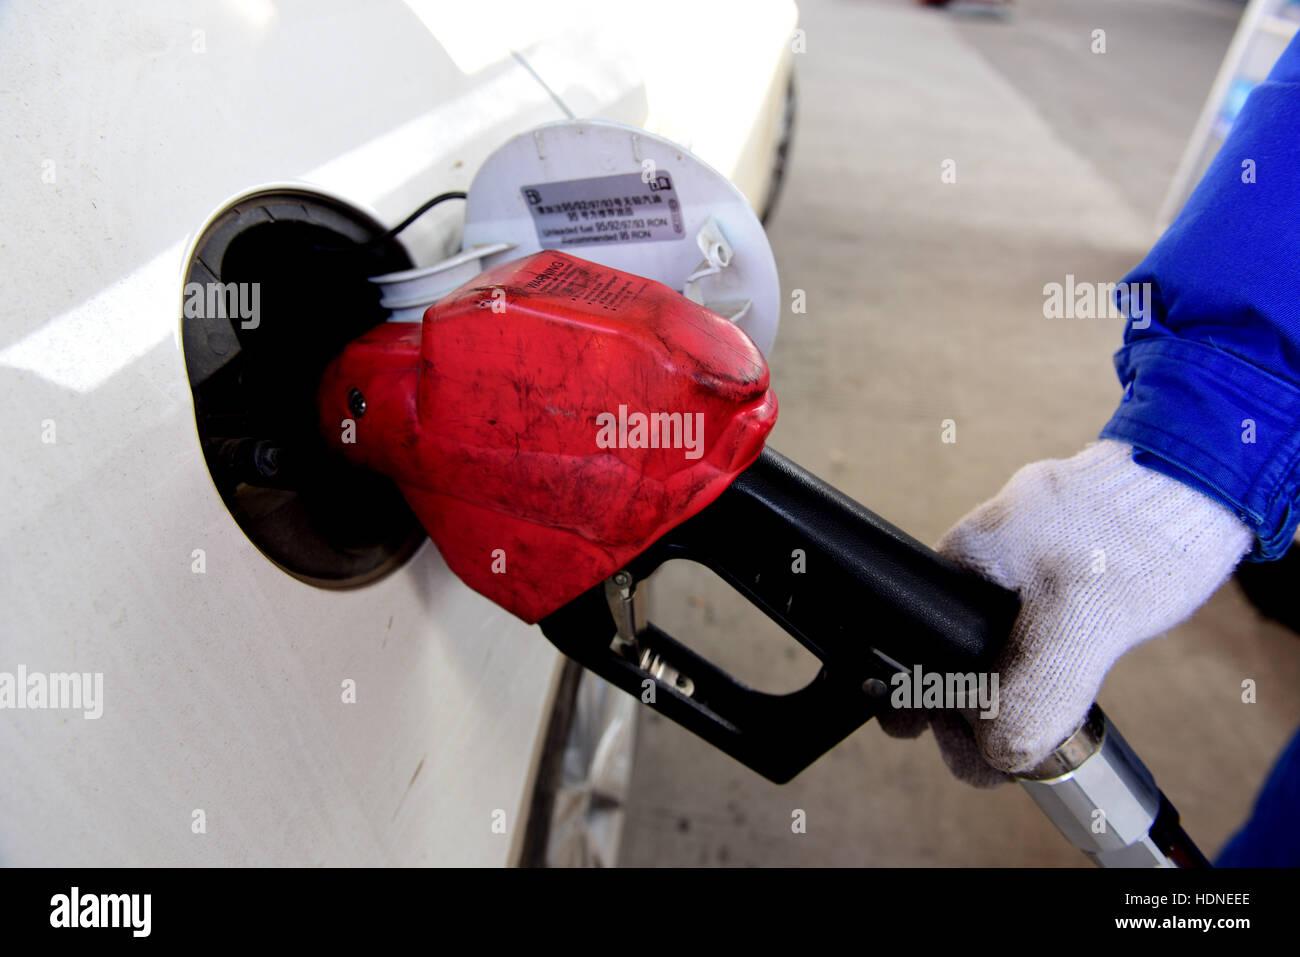 Shijiazhuang, Shijiazhuang, China. 14th Dec, 2016. A worker helps refuel a car at a gas station in Shijiazhuang, - Stock Image